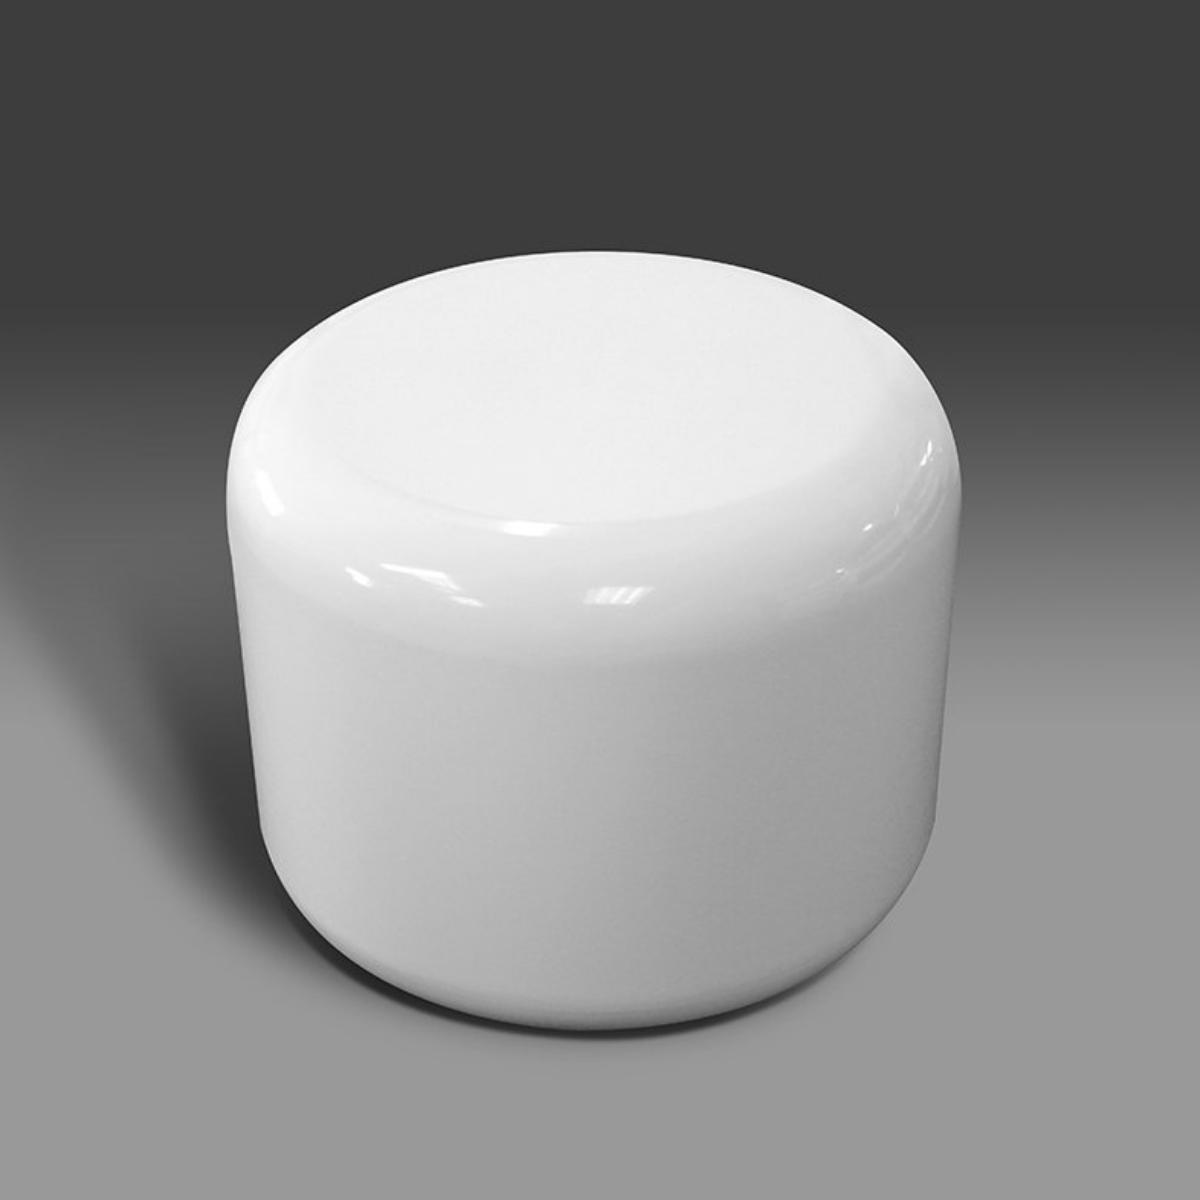 Rondo Modular Seat/Table